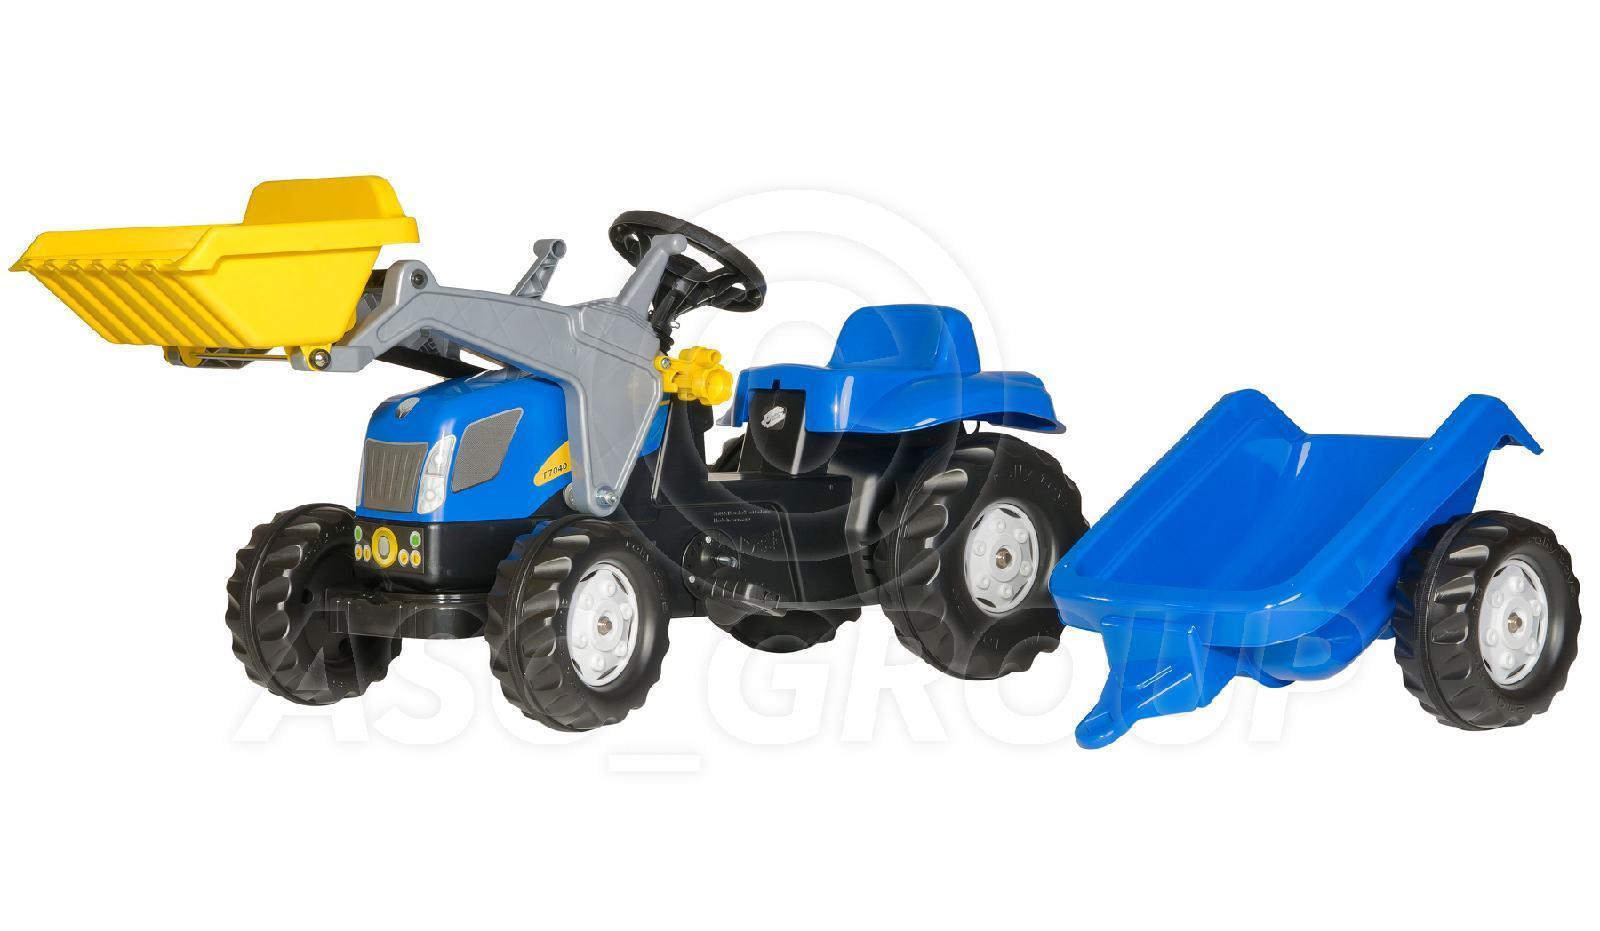 rolly toys new holland t 7040 rutscher pedale traktor. Black Bedroom Furniture Sets. Home Design Ideas